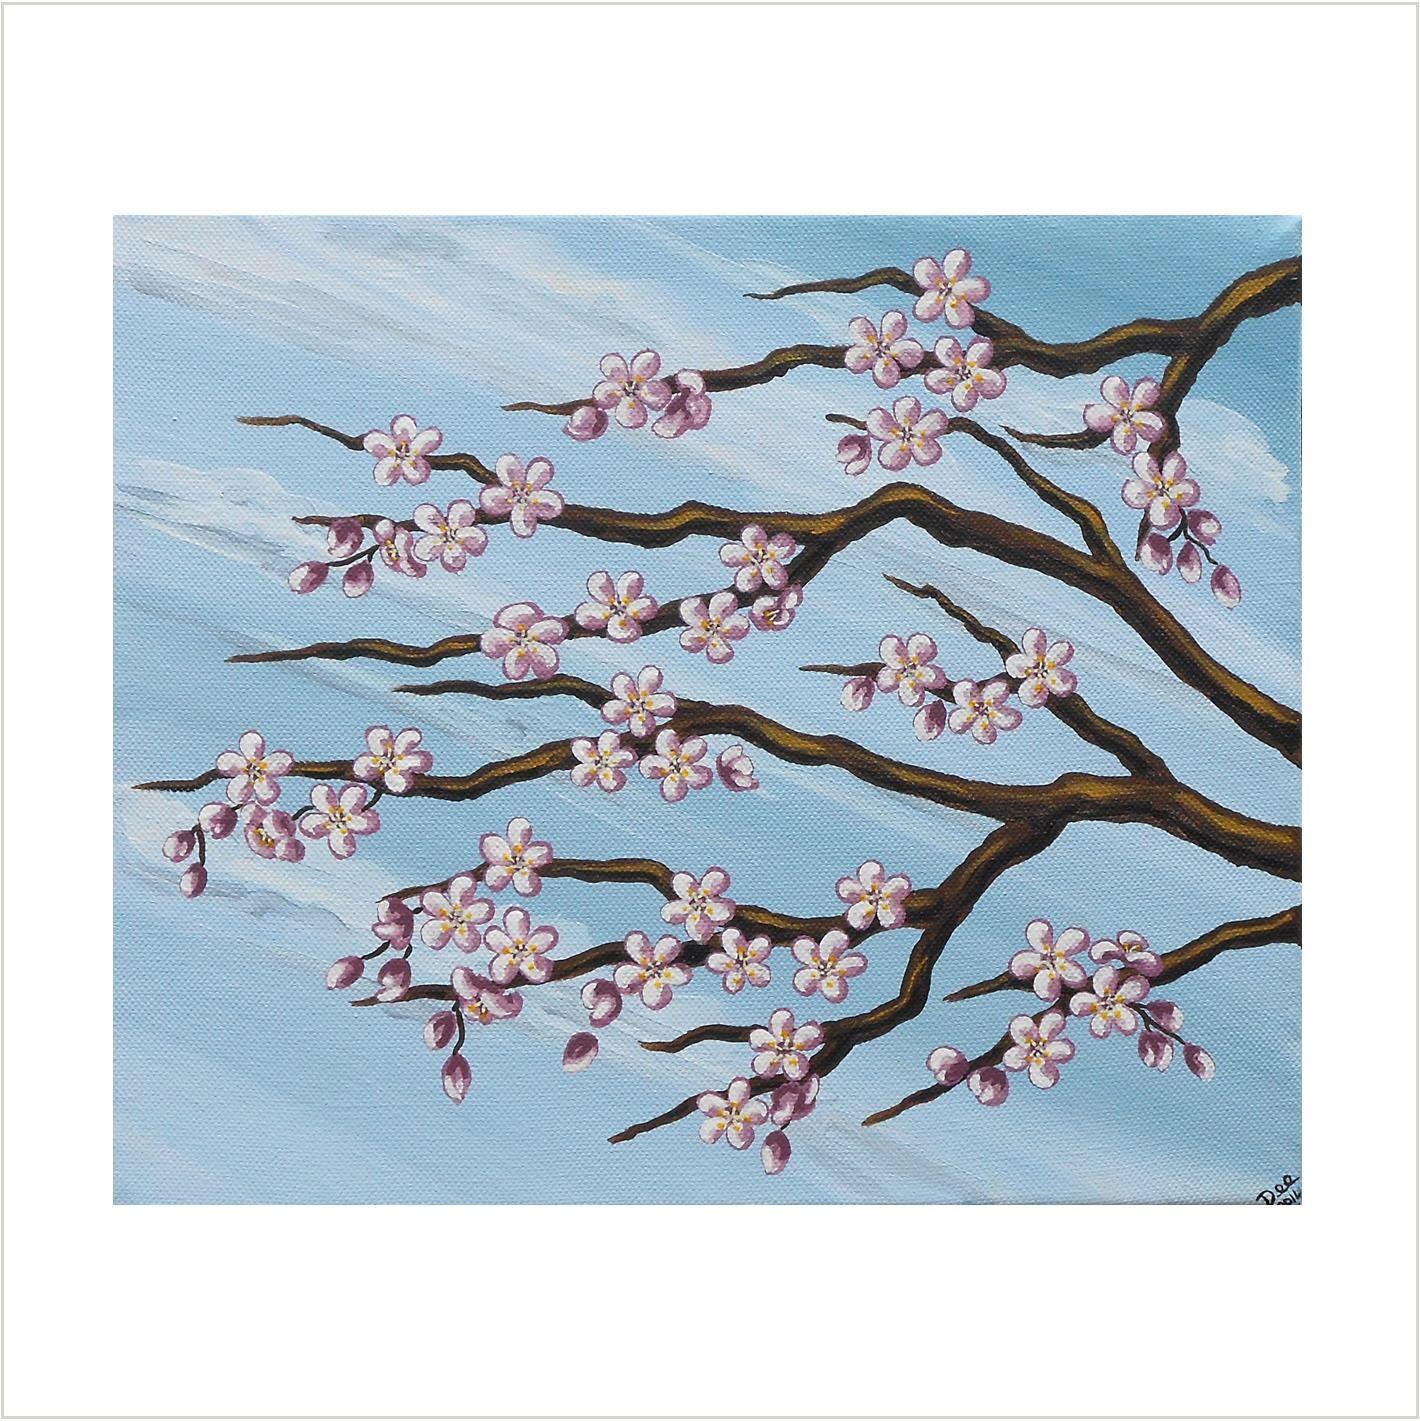 Pink Cherry Blossom Painting Original Acrylic Painting On Canvas Japanese Blossom Art Blossom Tree A Cherry Blossom Painting Cherry Blossom Art Blossoms Art